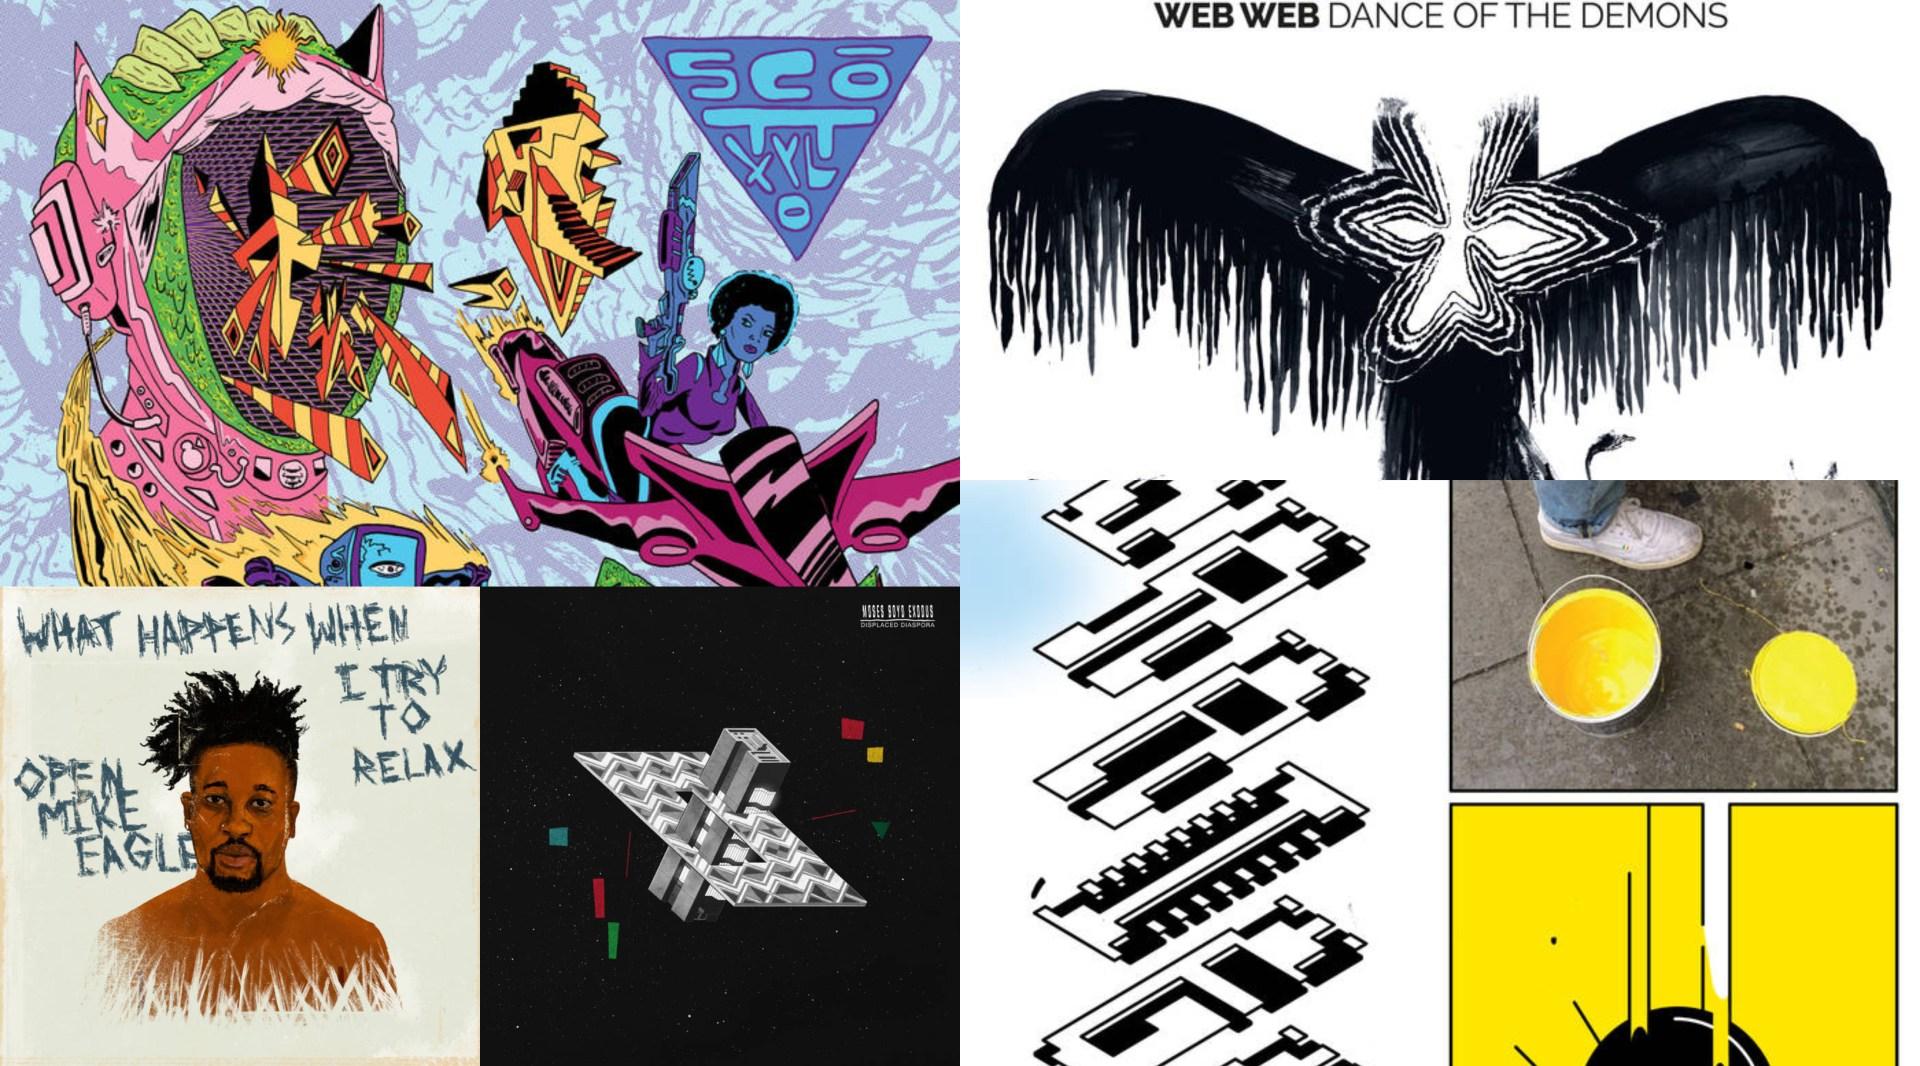 Twistedsoul: New & Noteworthy Albums